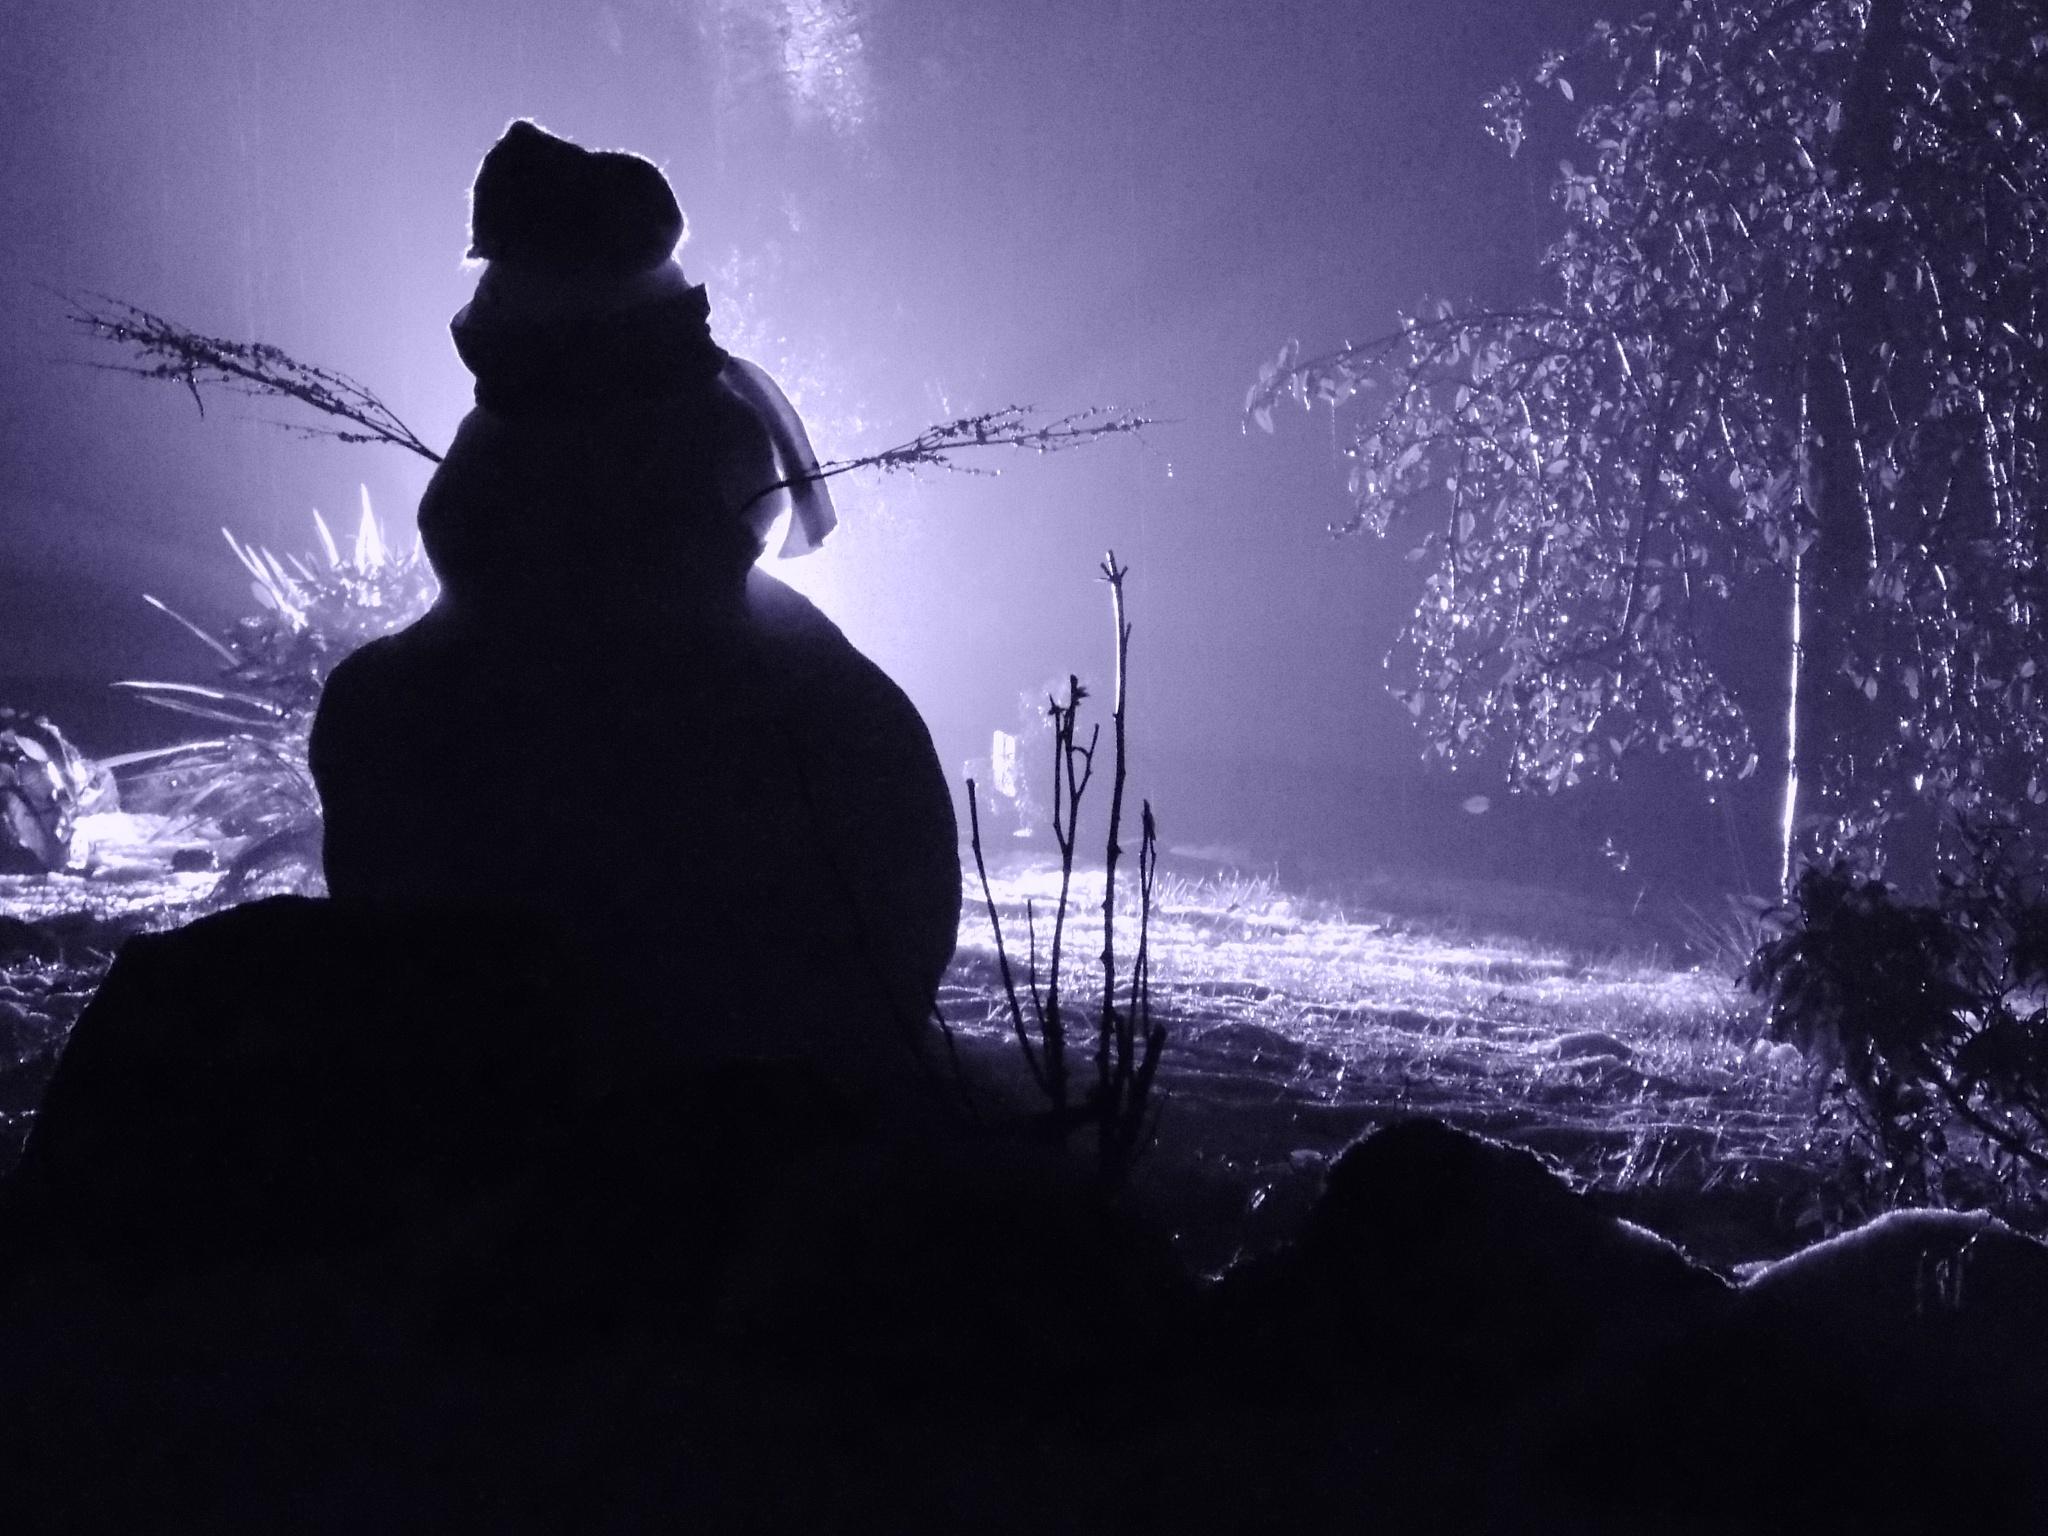 The Snowman by Denis_Bond